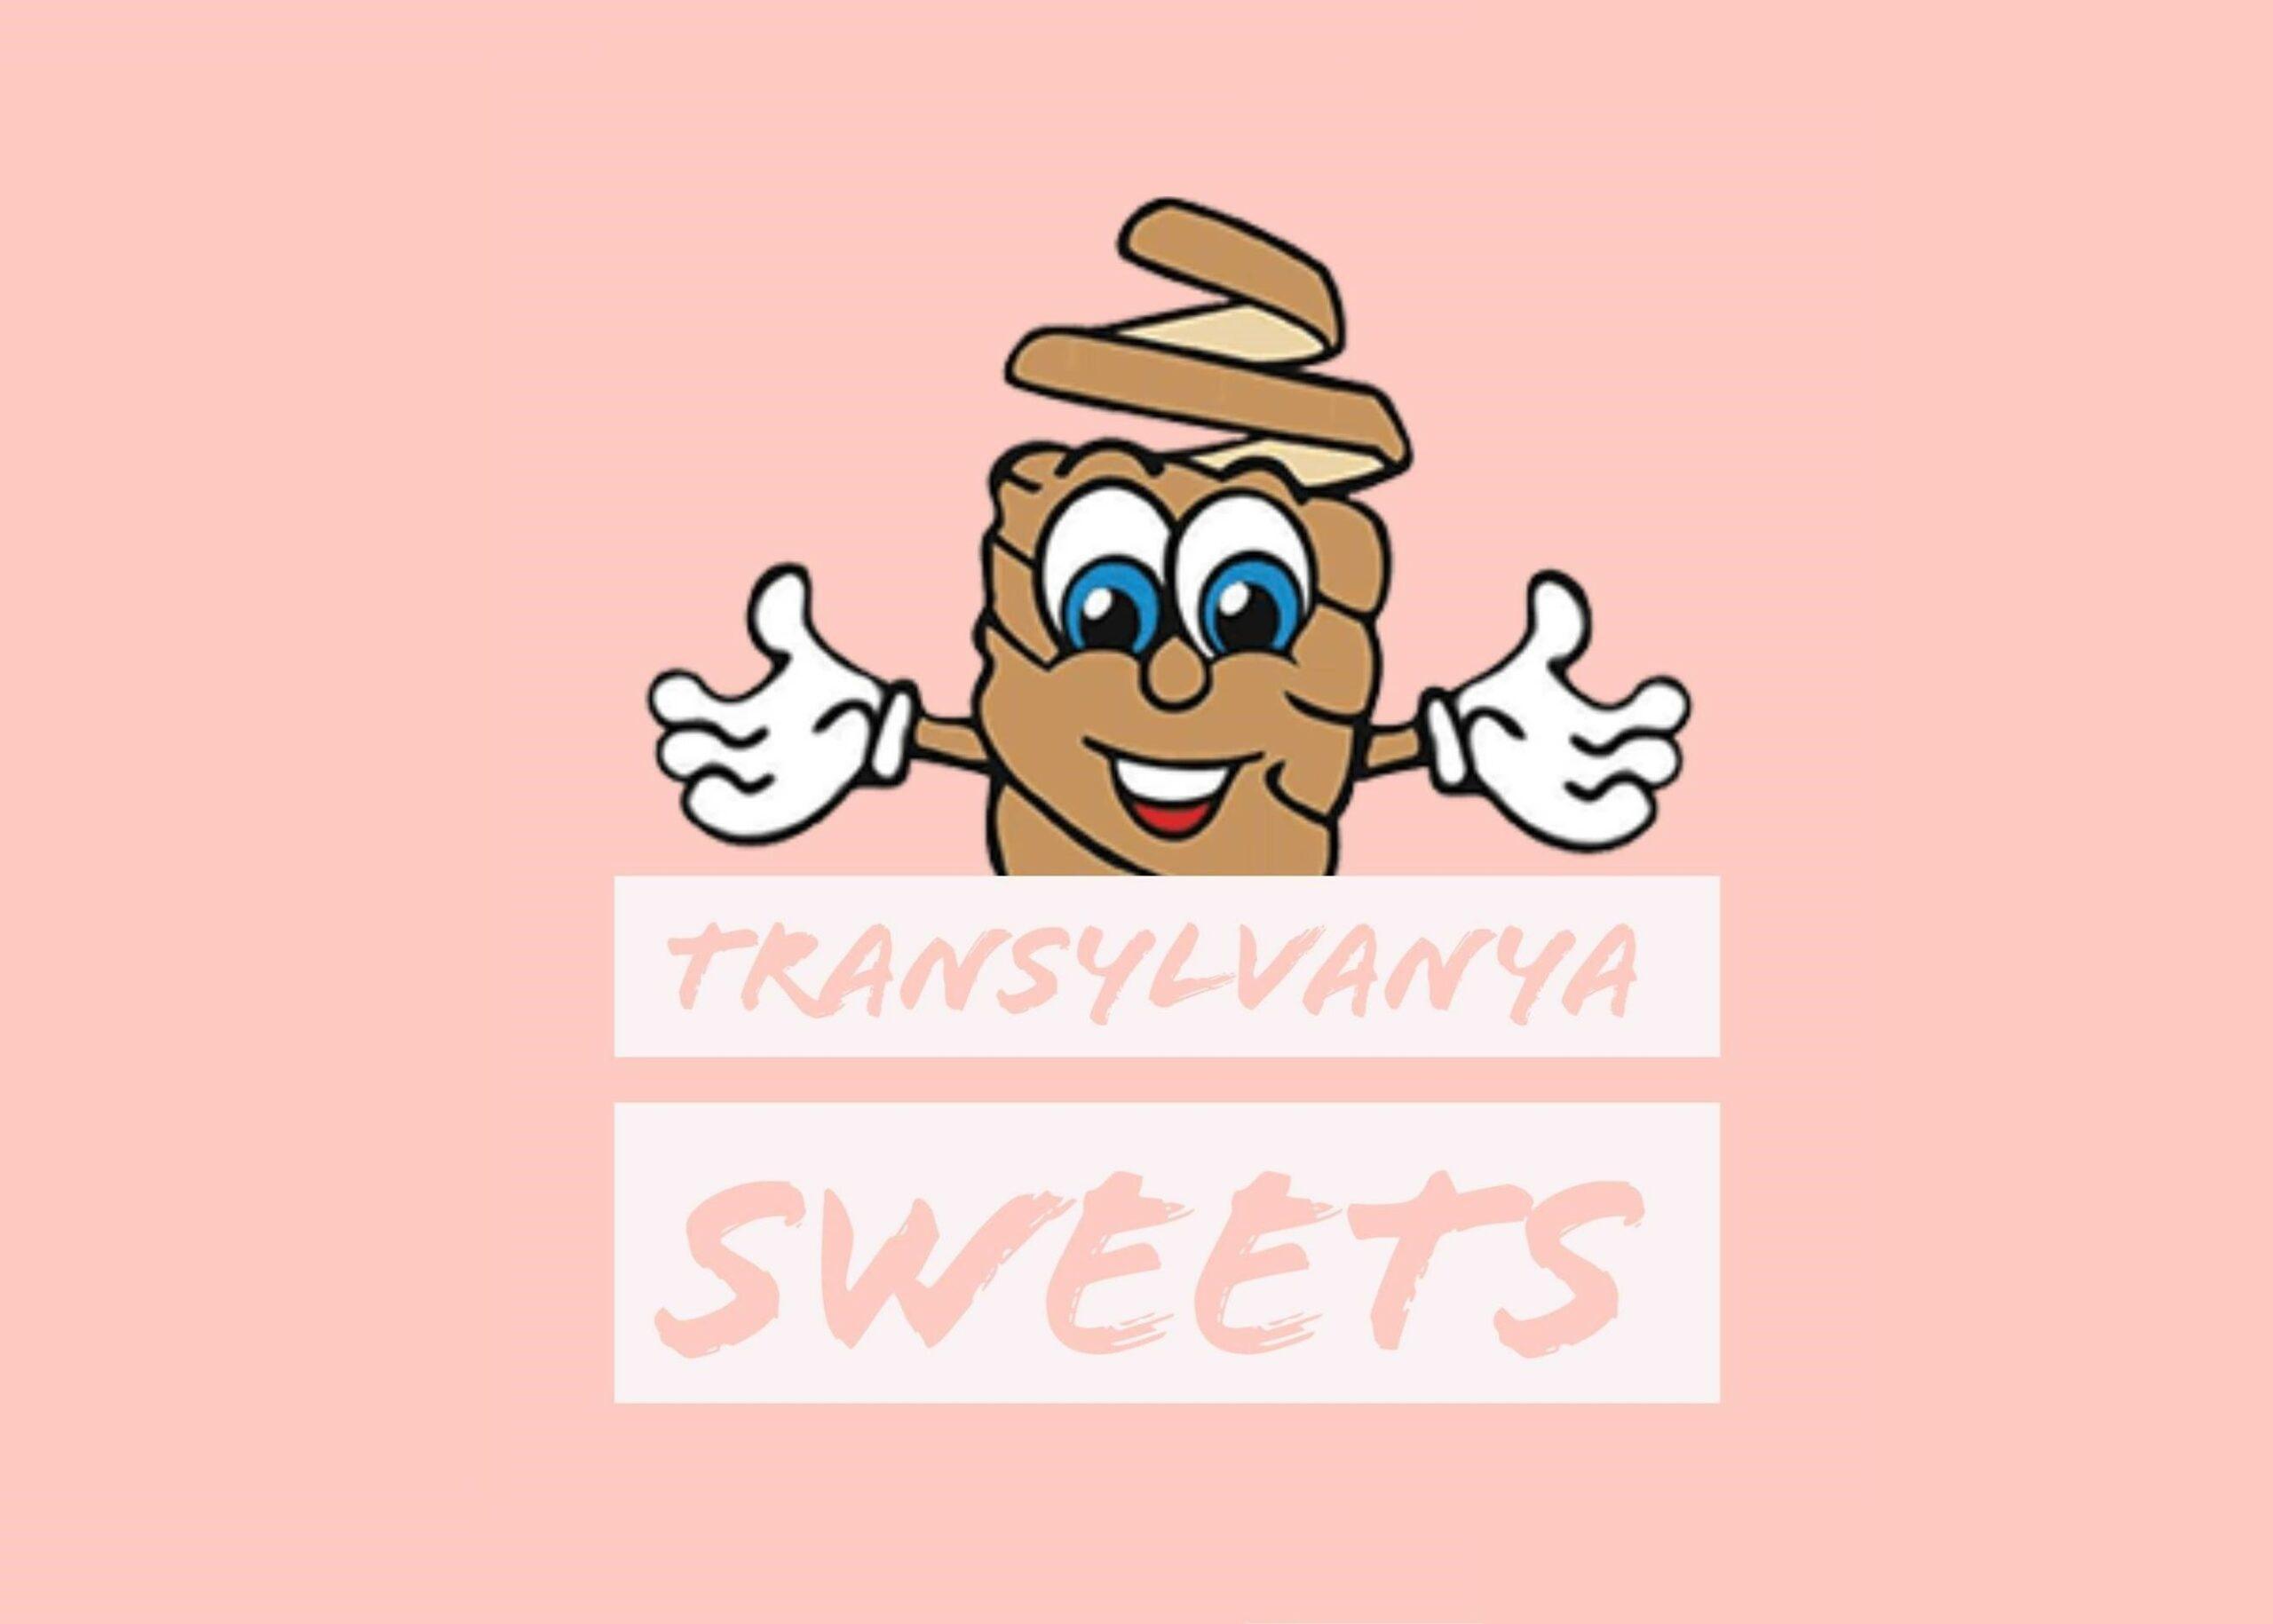 Transylvania Sweets